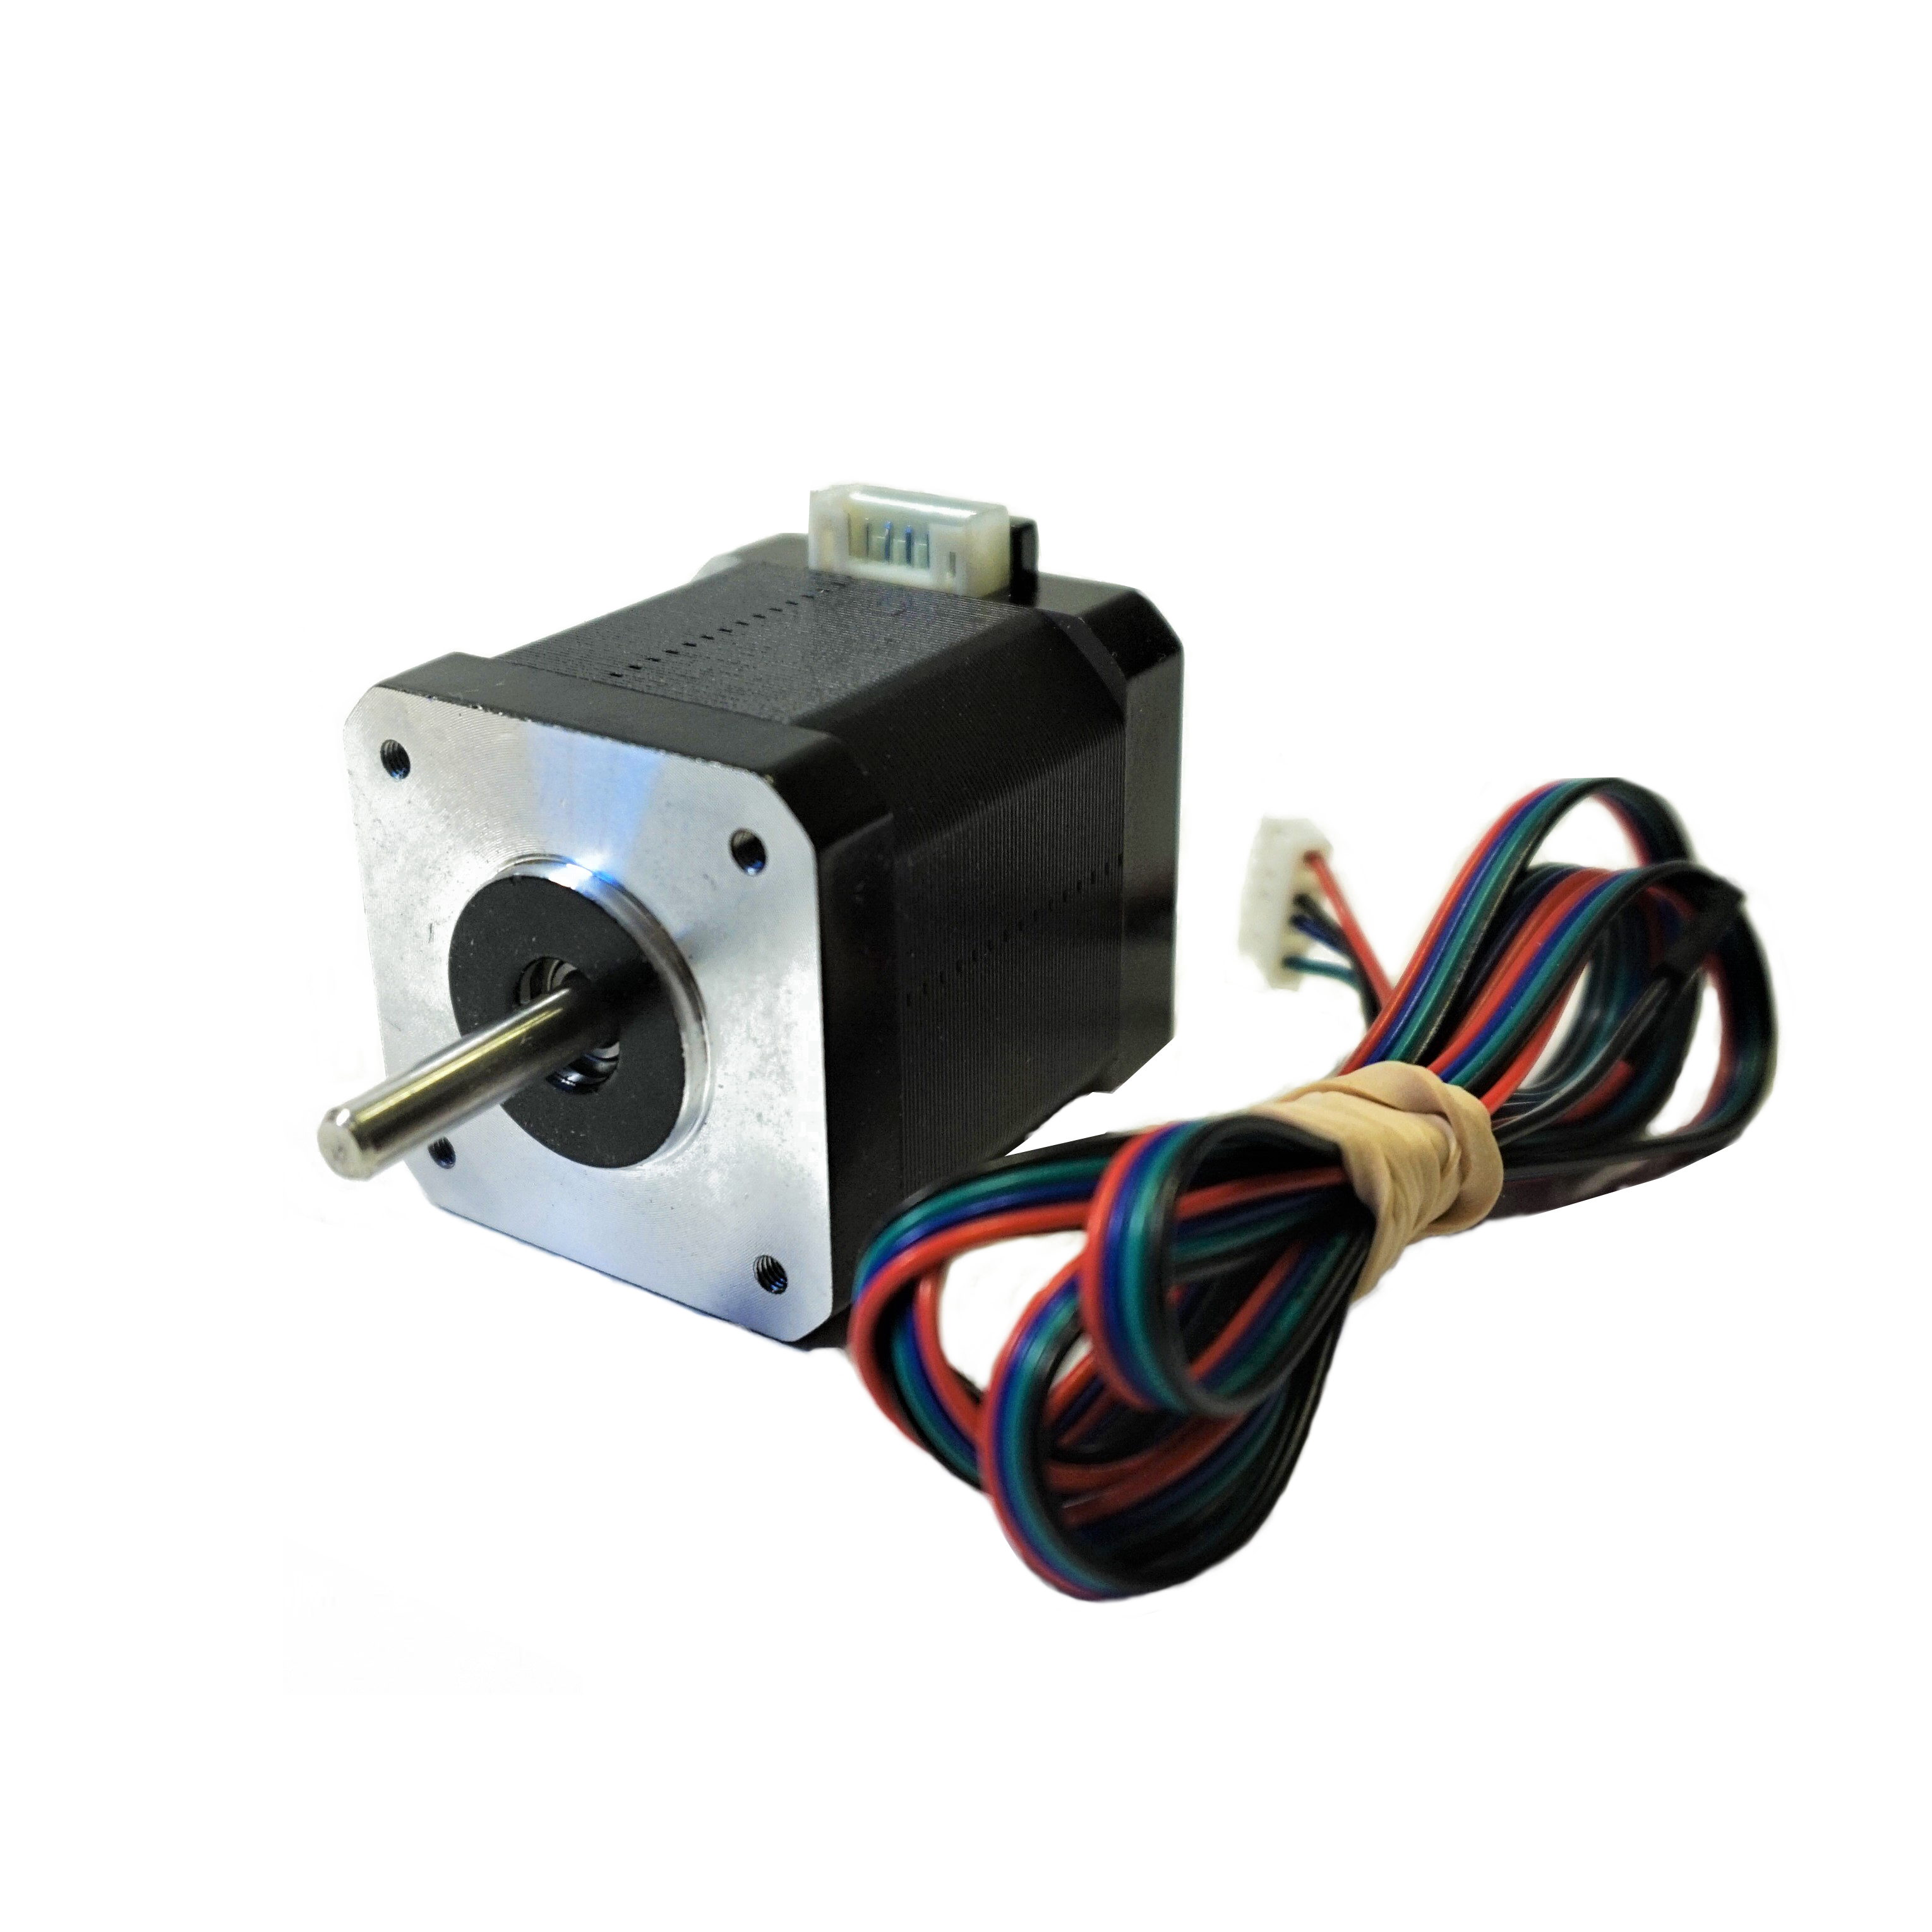 Nema 17 48mm stepper motor sienci labs for Nema 17 motor specs